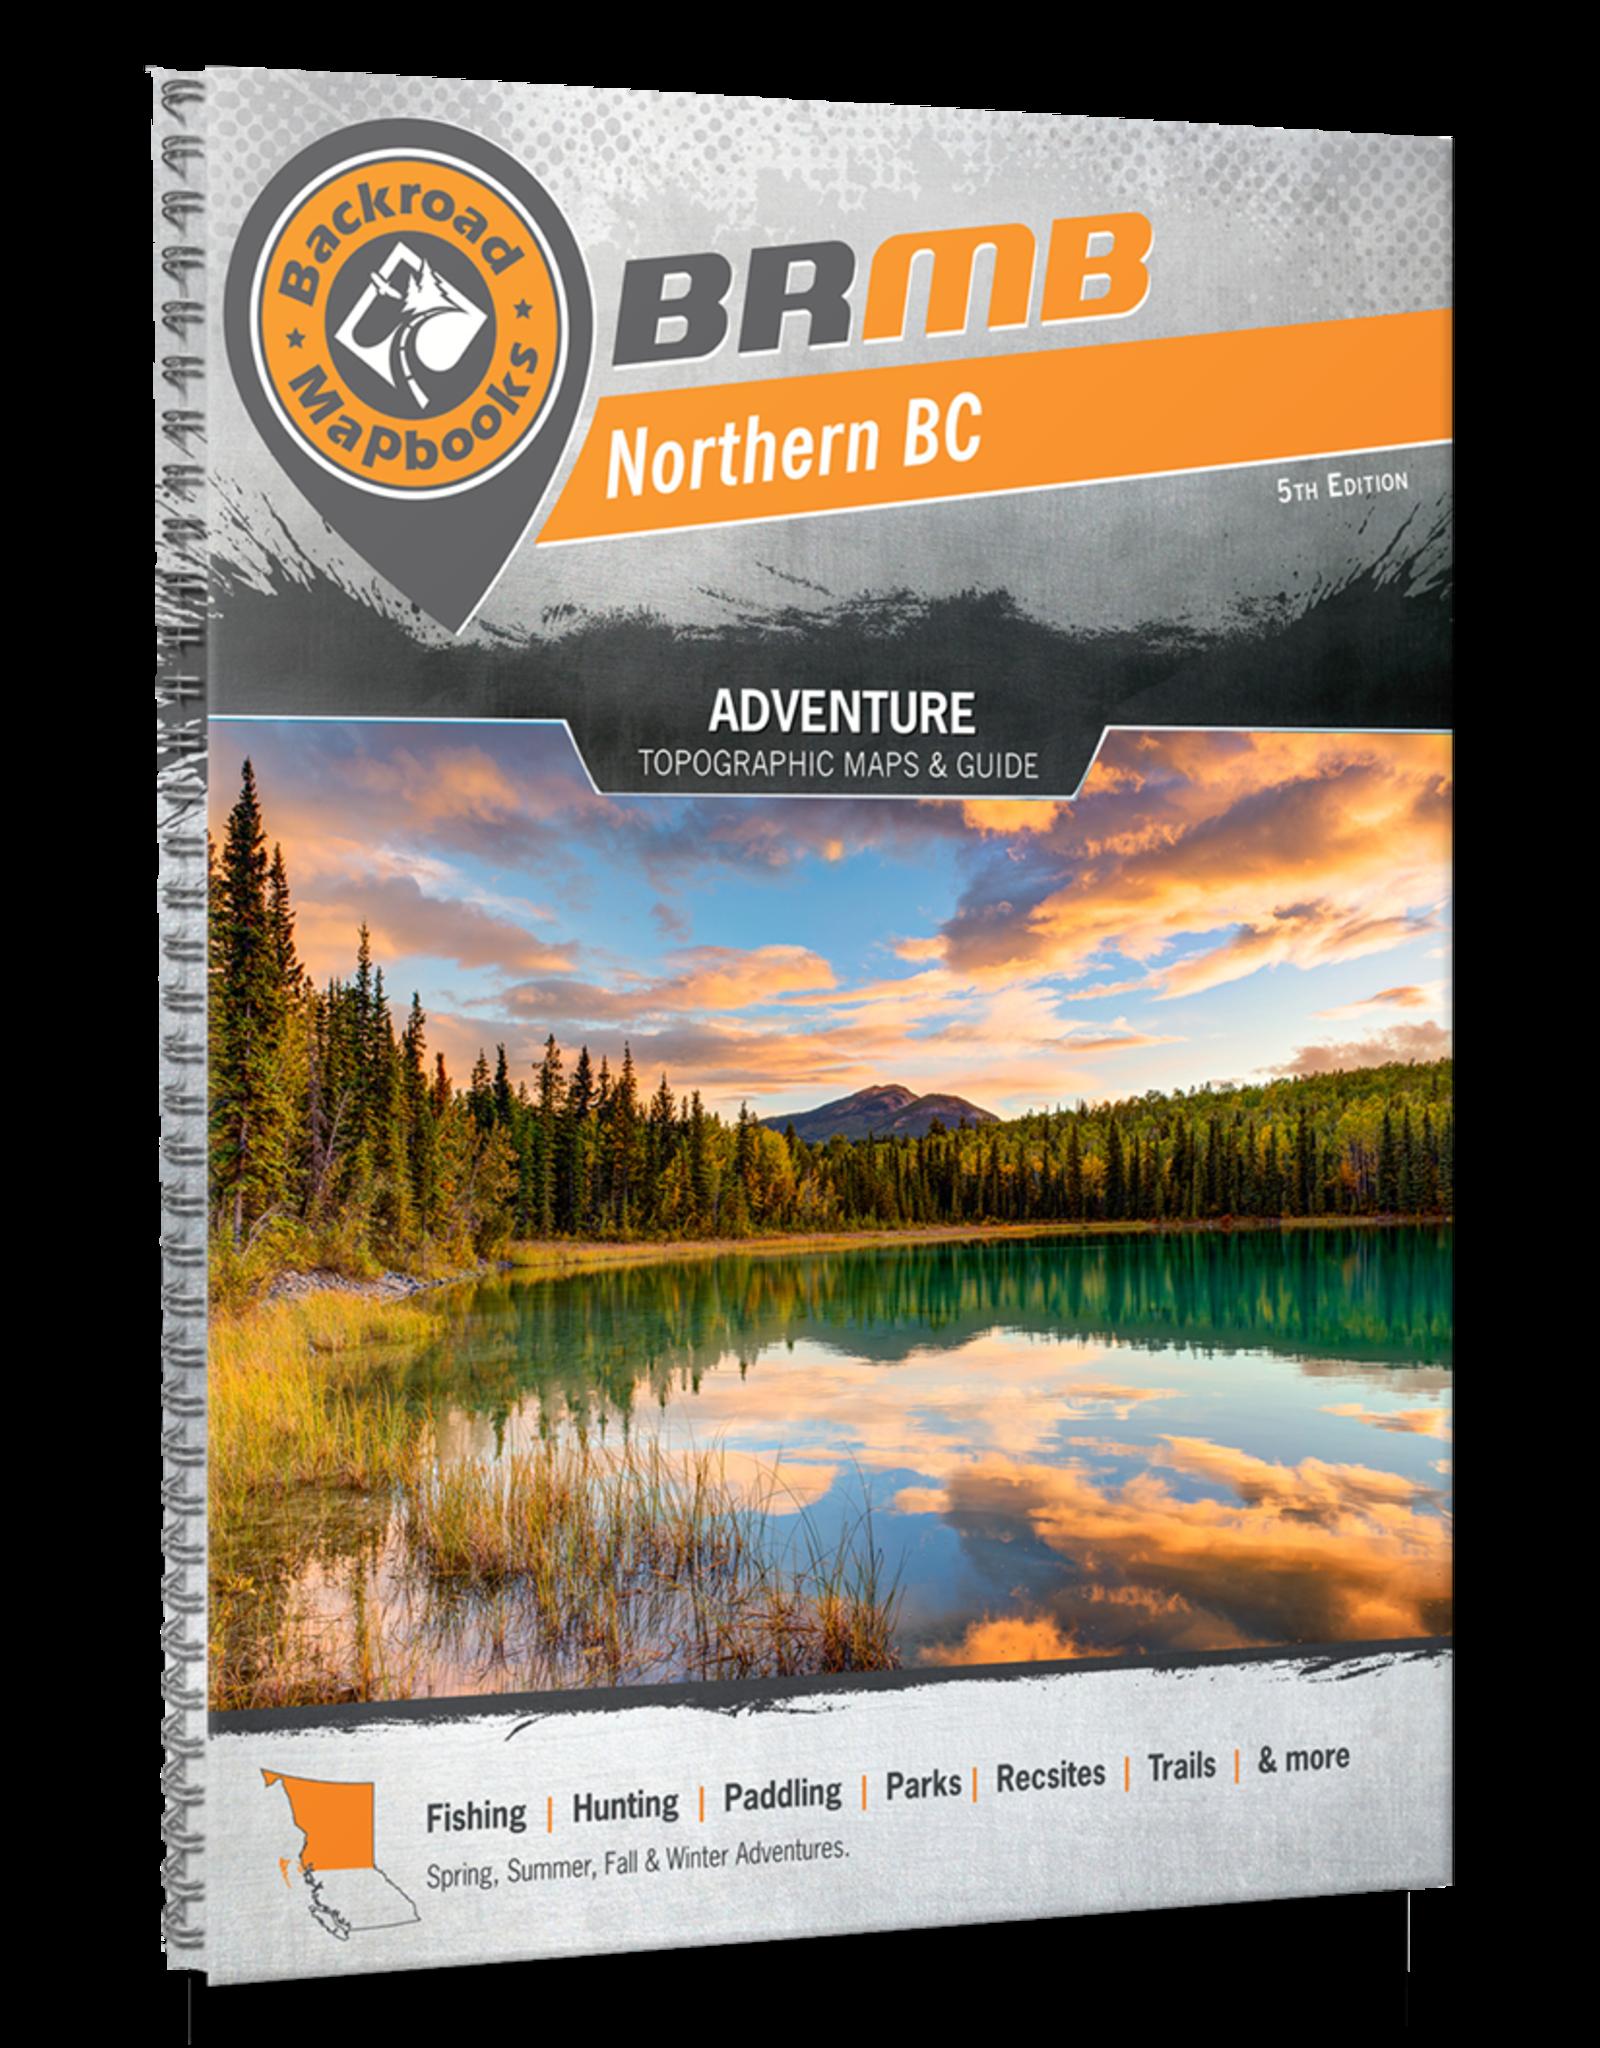 BRMB - NORTHERN BC 5TH EDITION #NOBC